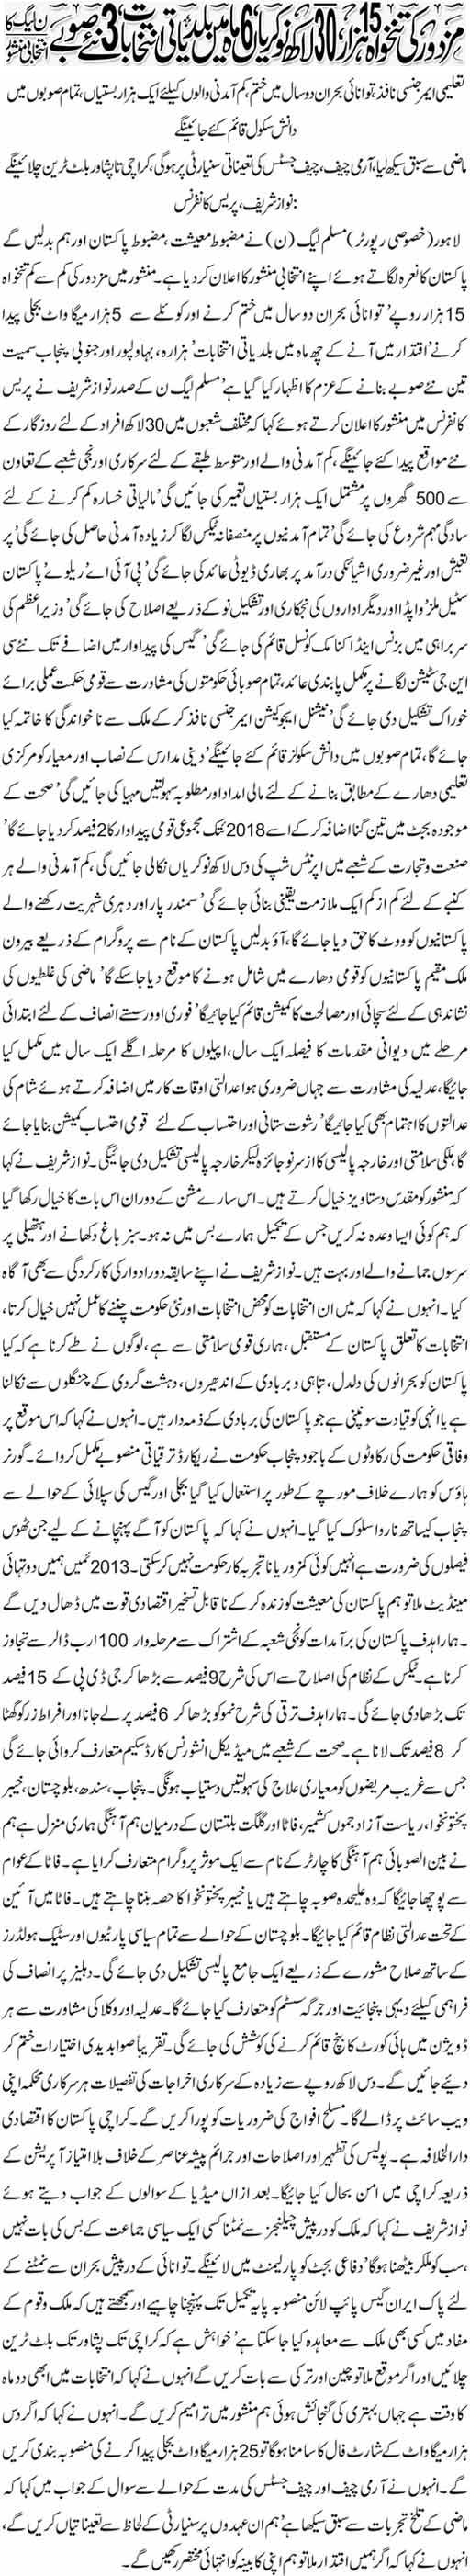 PMLN Announces Manifesto For Election 2013